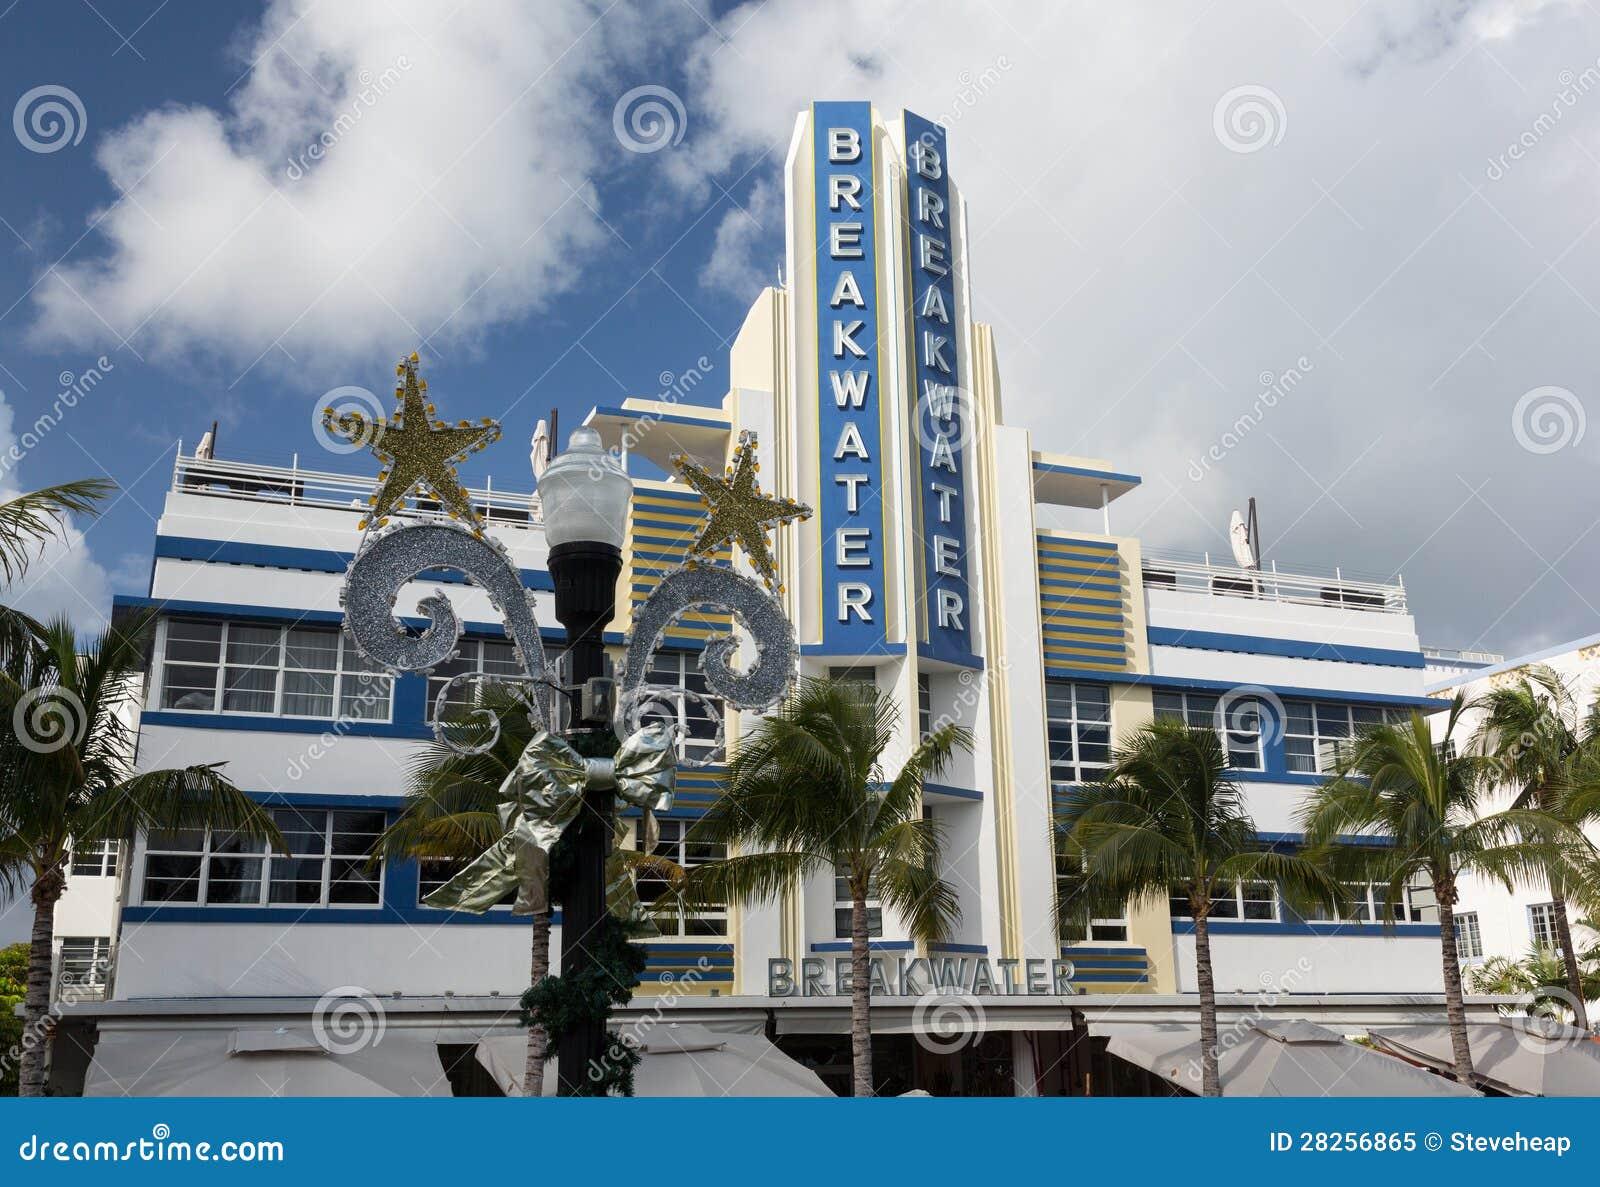 Breakwater Hotel In Miami Beach Art Deco Editorial Image - Image ...